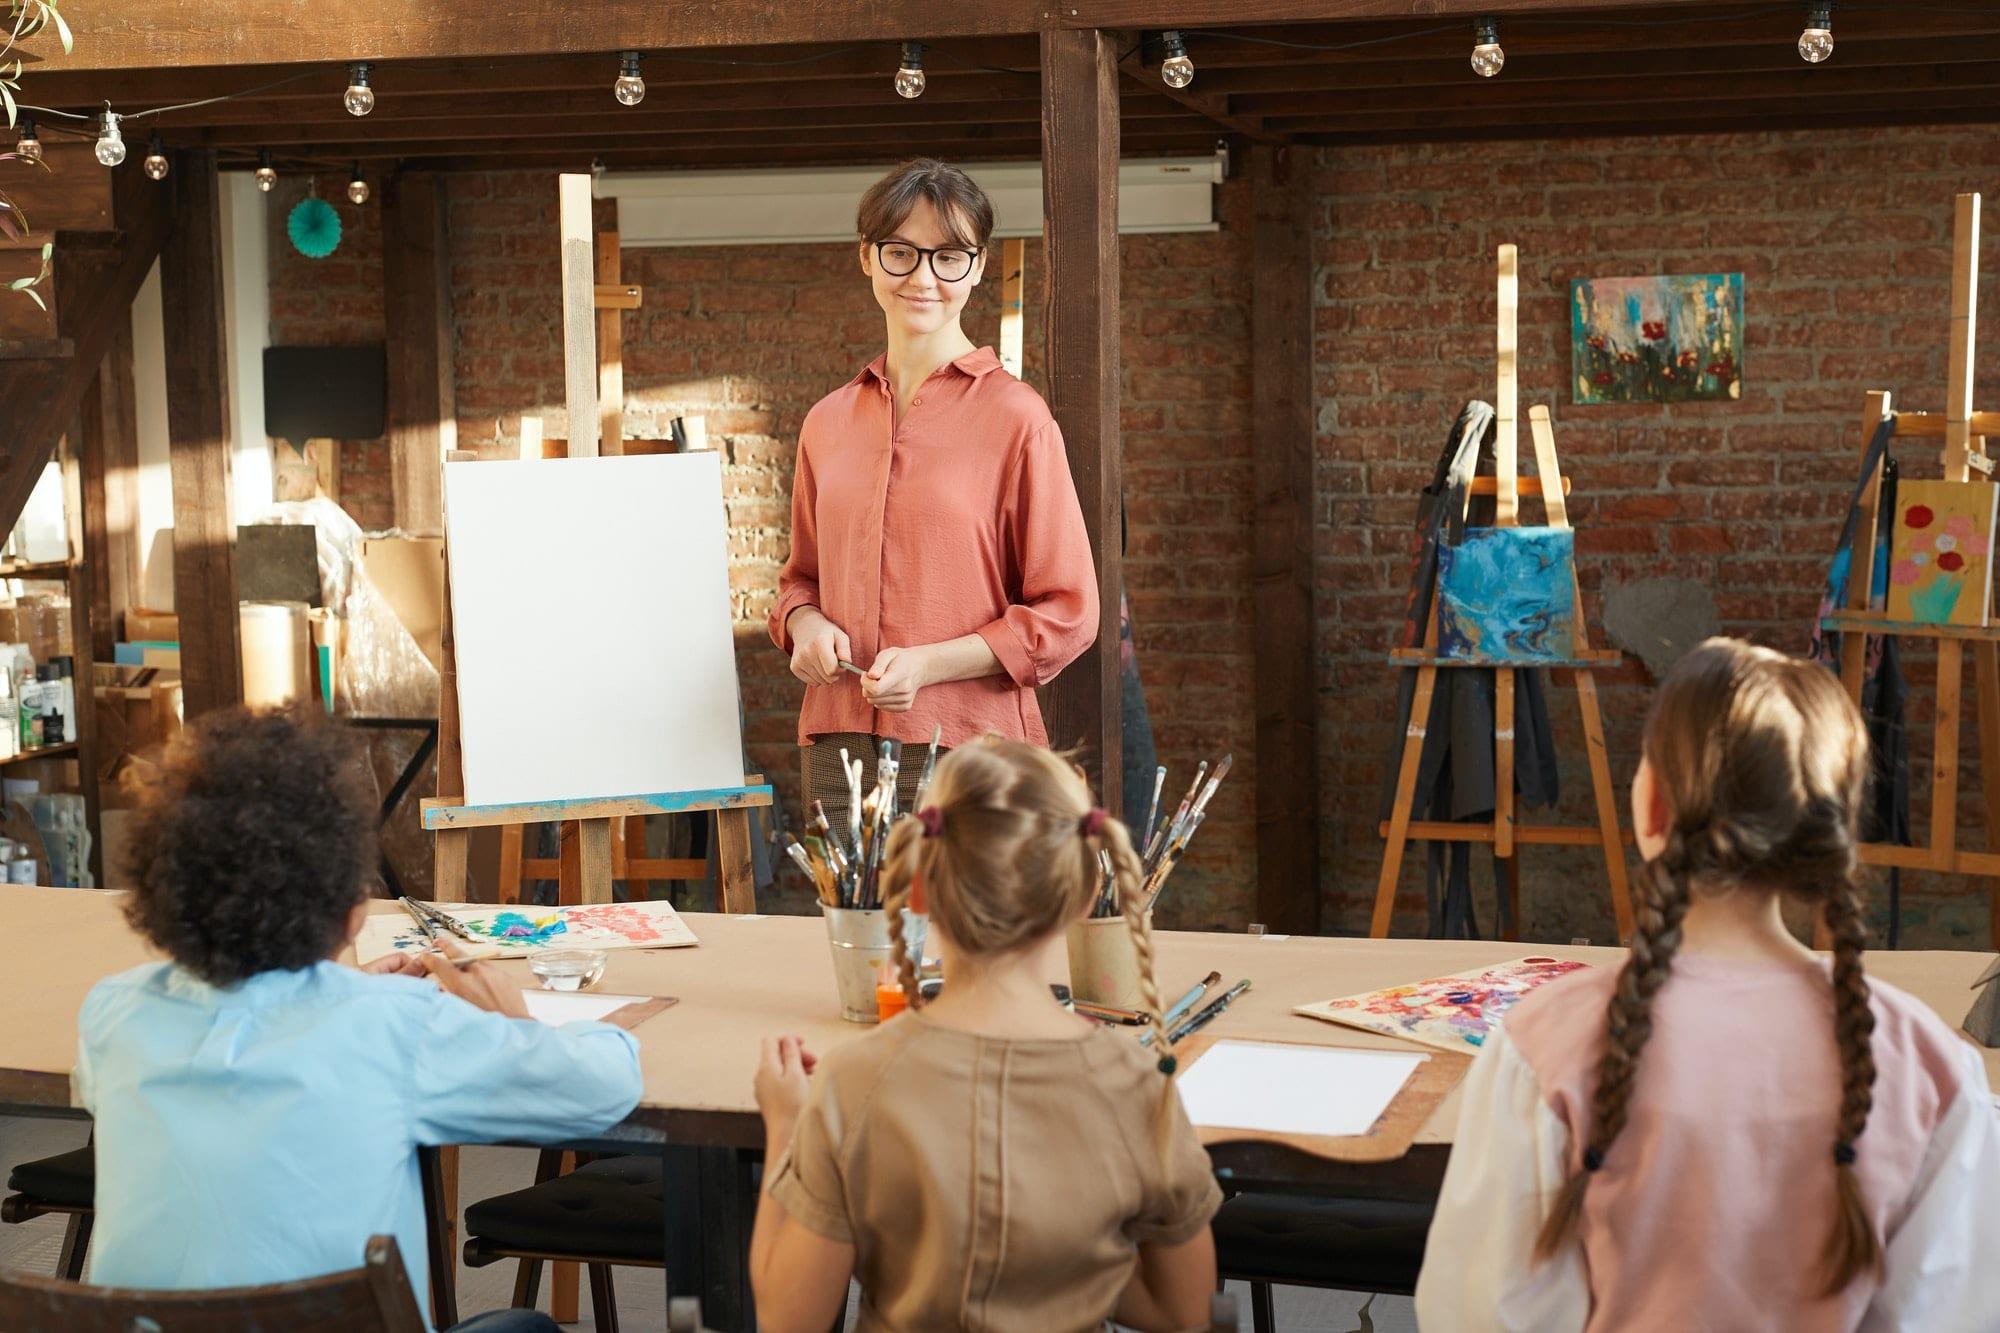 Art lesson in art studio